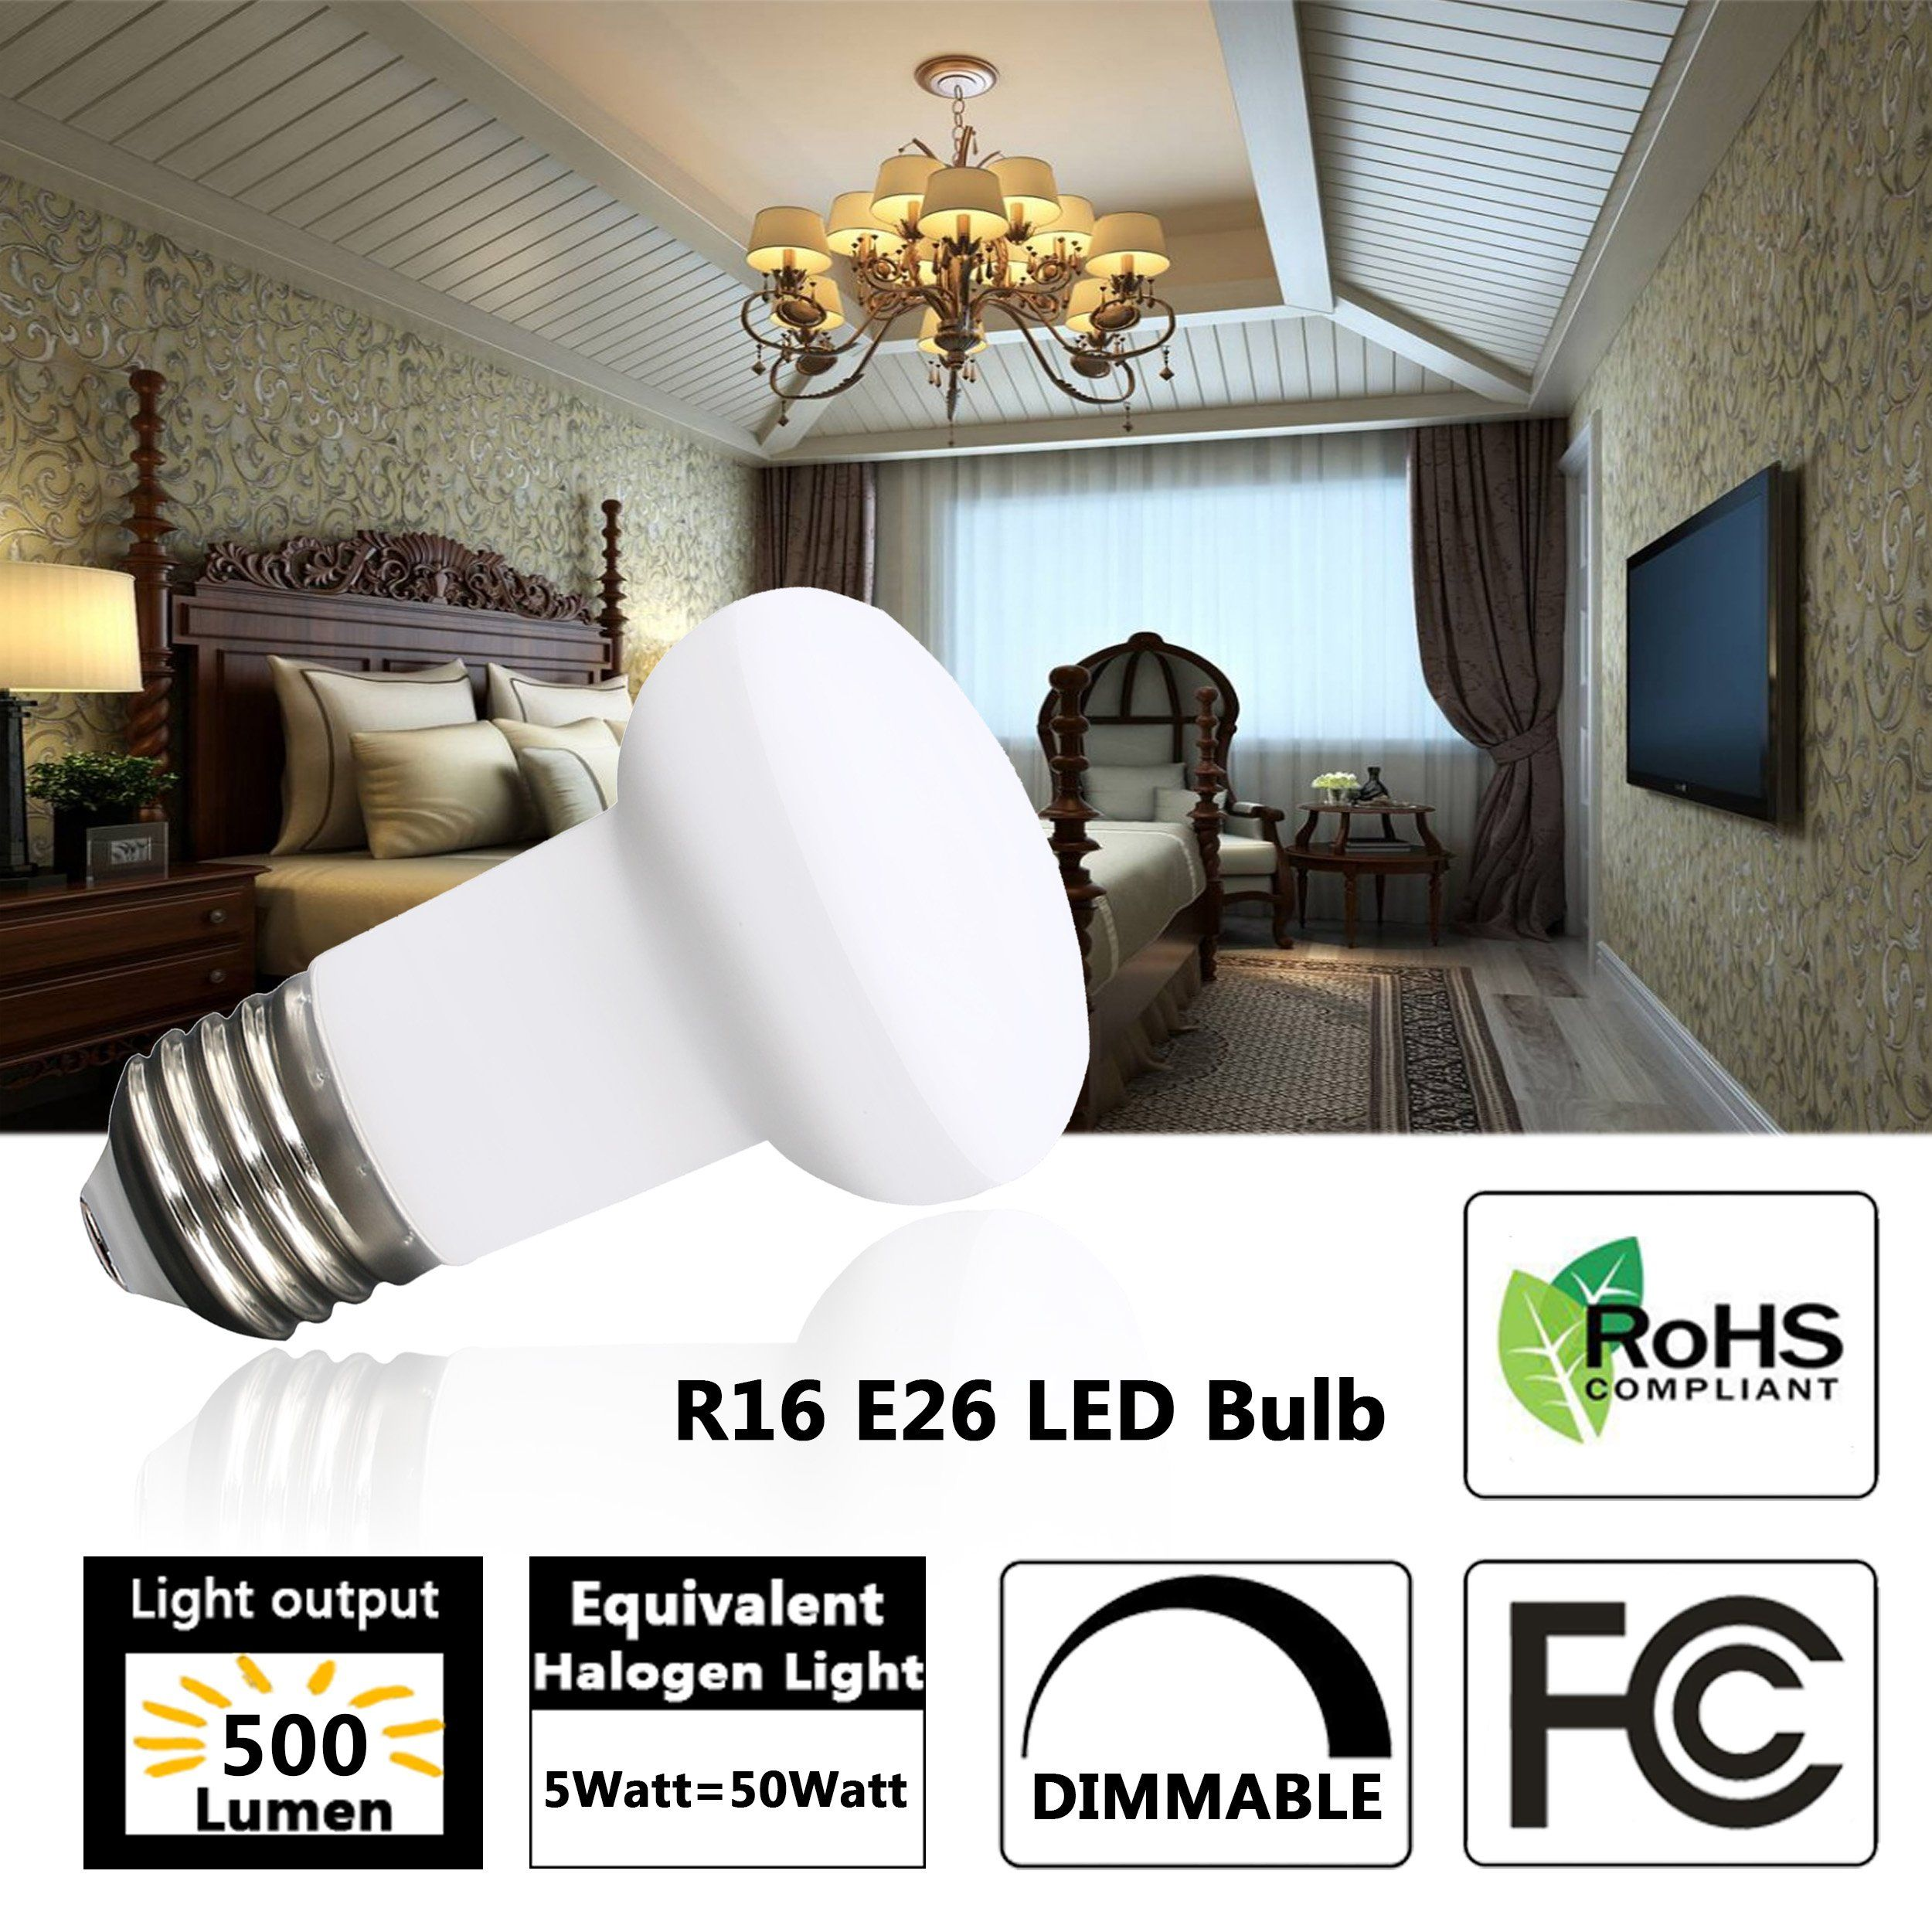 40 Watt R16 Mini Reflector Flood Light Bulbusing Only 5 Wattmedium Basee26 3000k Soft White Dimmable Edison Bulb 120 Volt 500 Lumens6 Pac